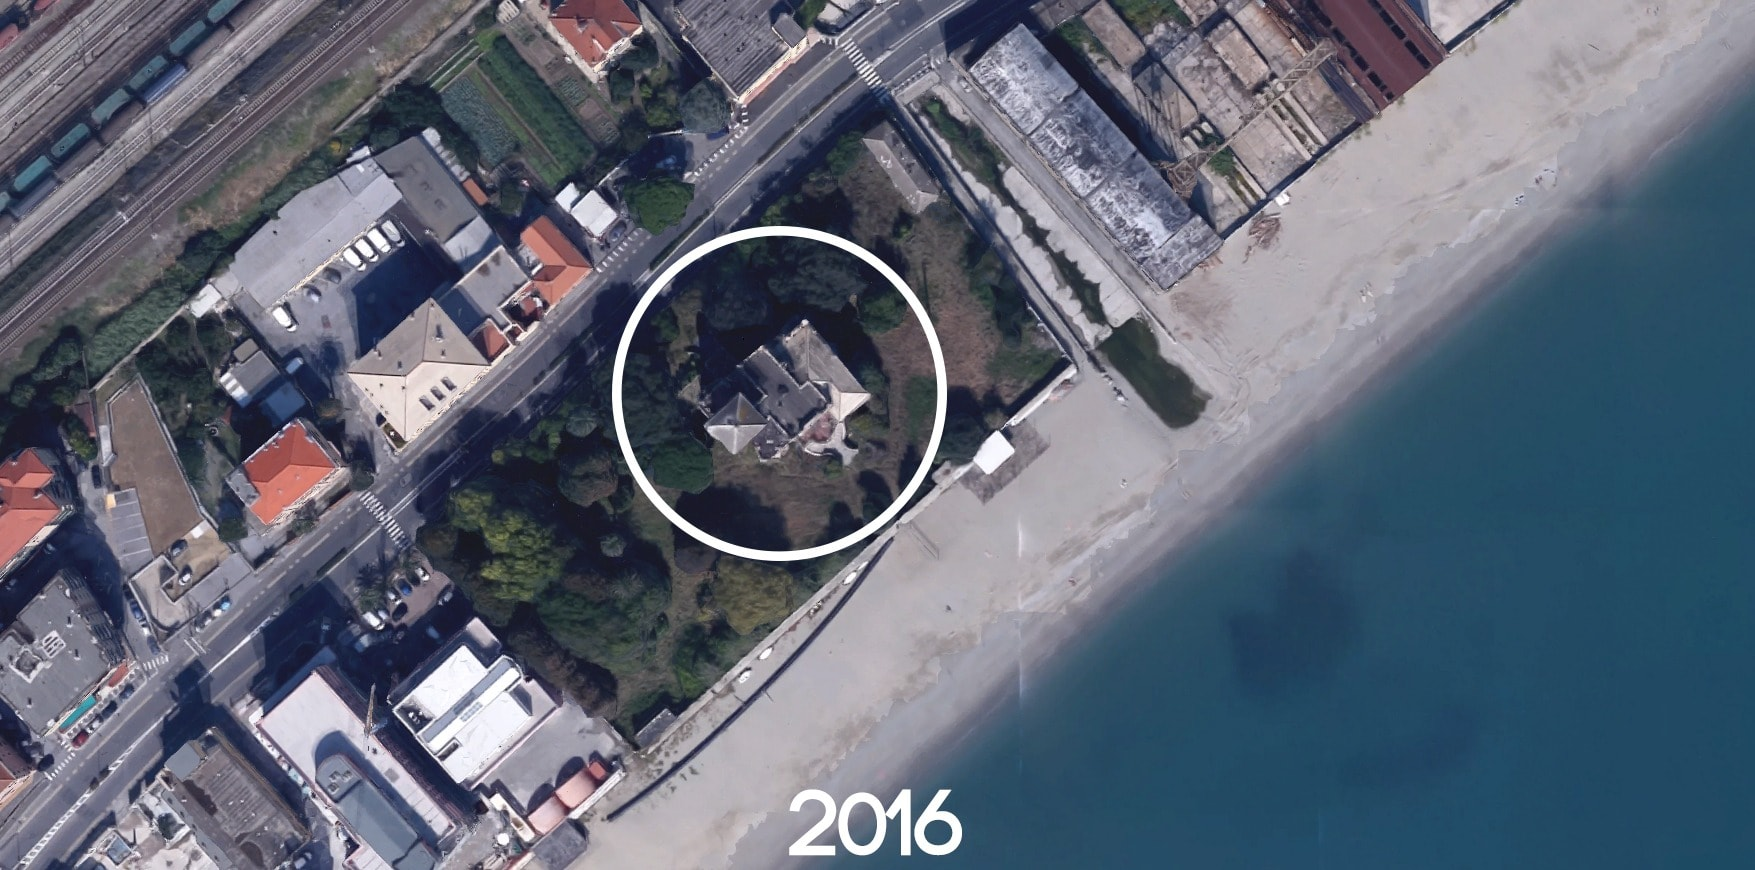 Villa abandonnée en Italie | urbexsession.com/villa-cesare-serviatti | Urbex Italie